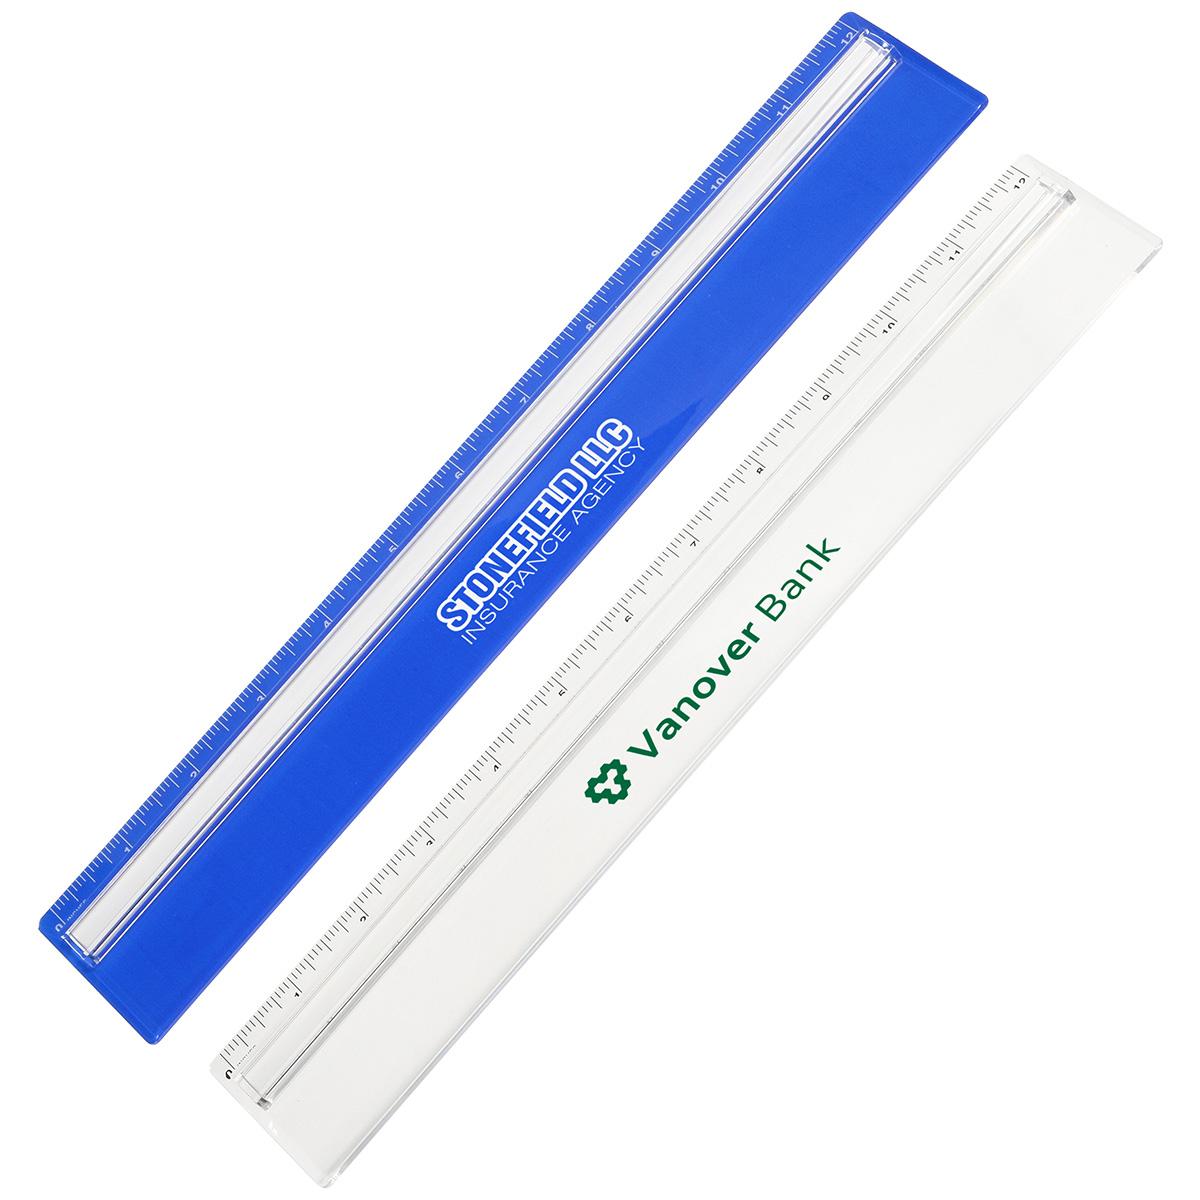 Magni-ruler, WOF-MR10, 1 Colour Imprint